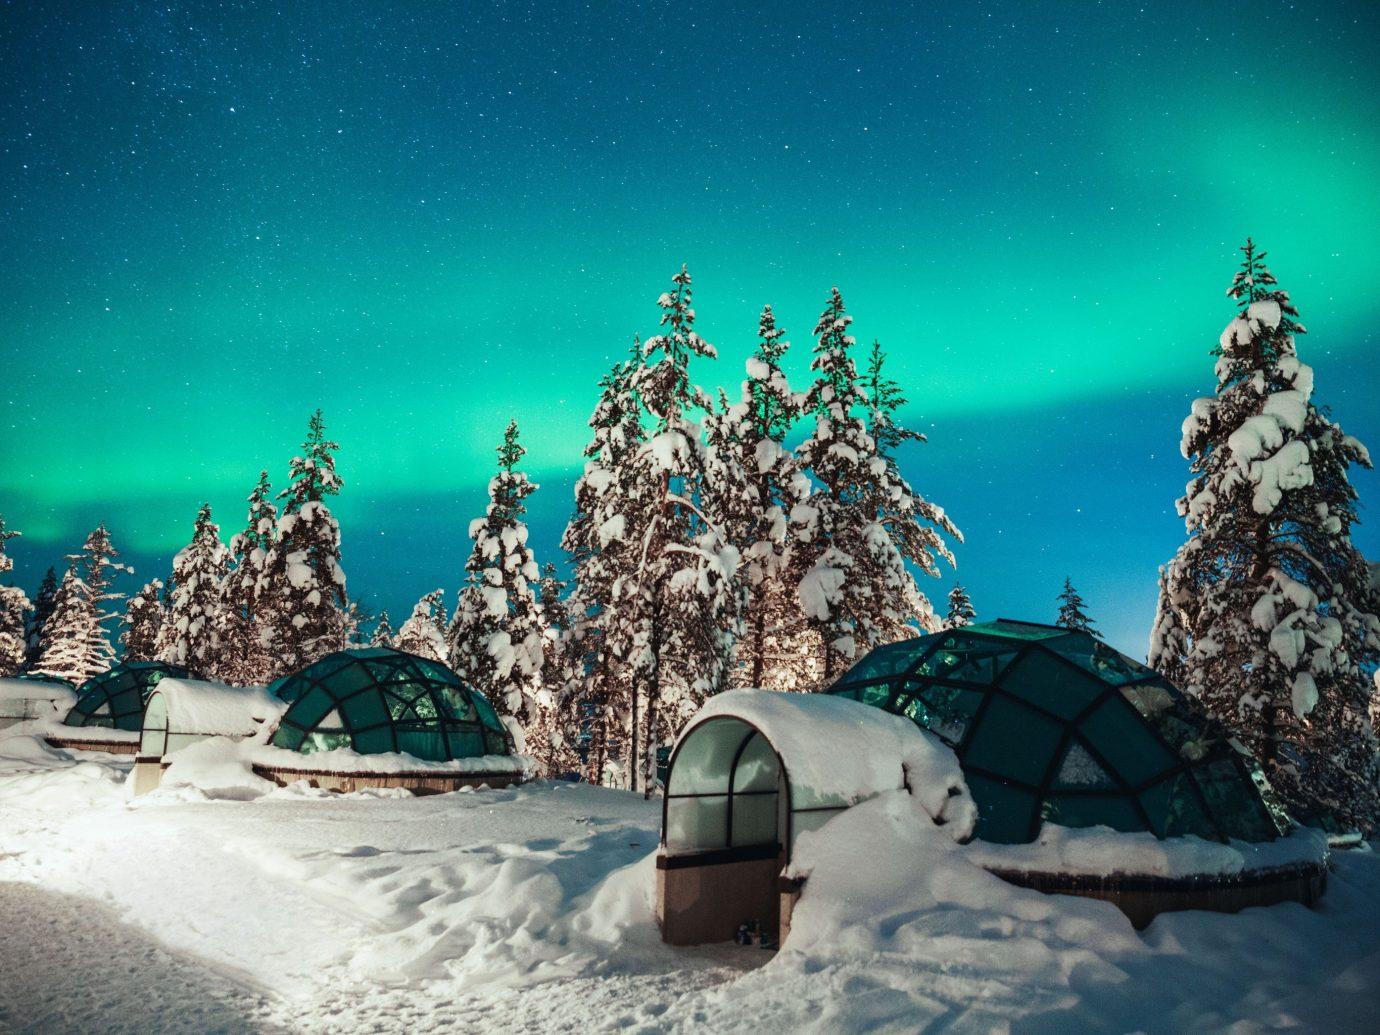 Trip Ideas outdoor Winter snow night screenshot world aurora